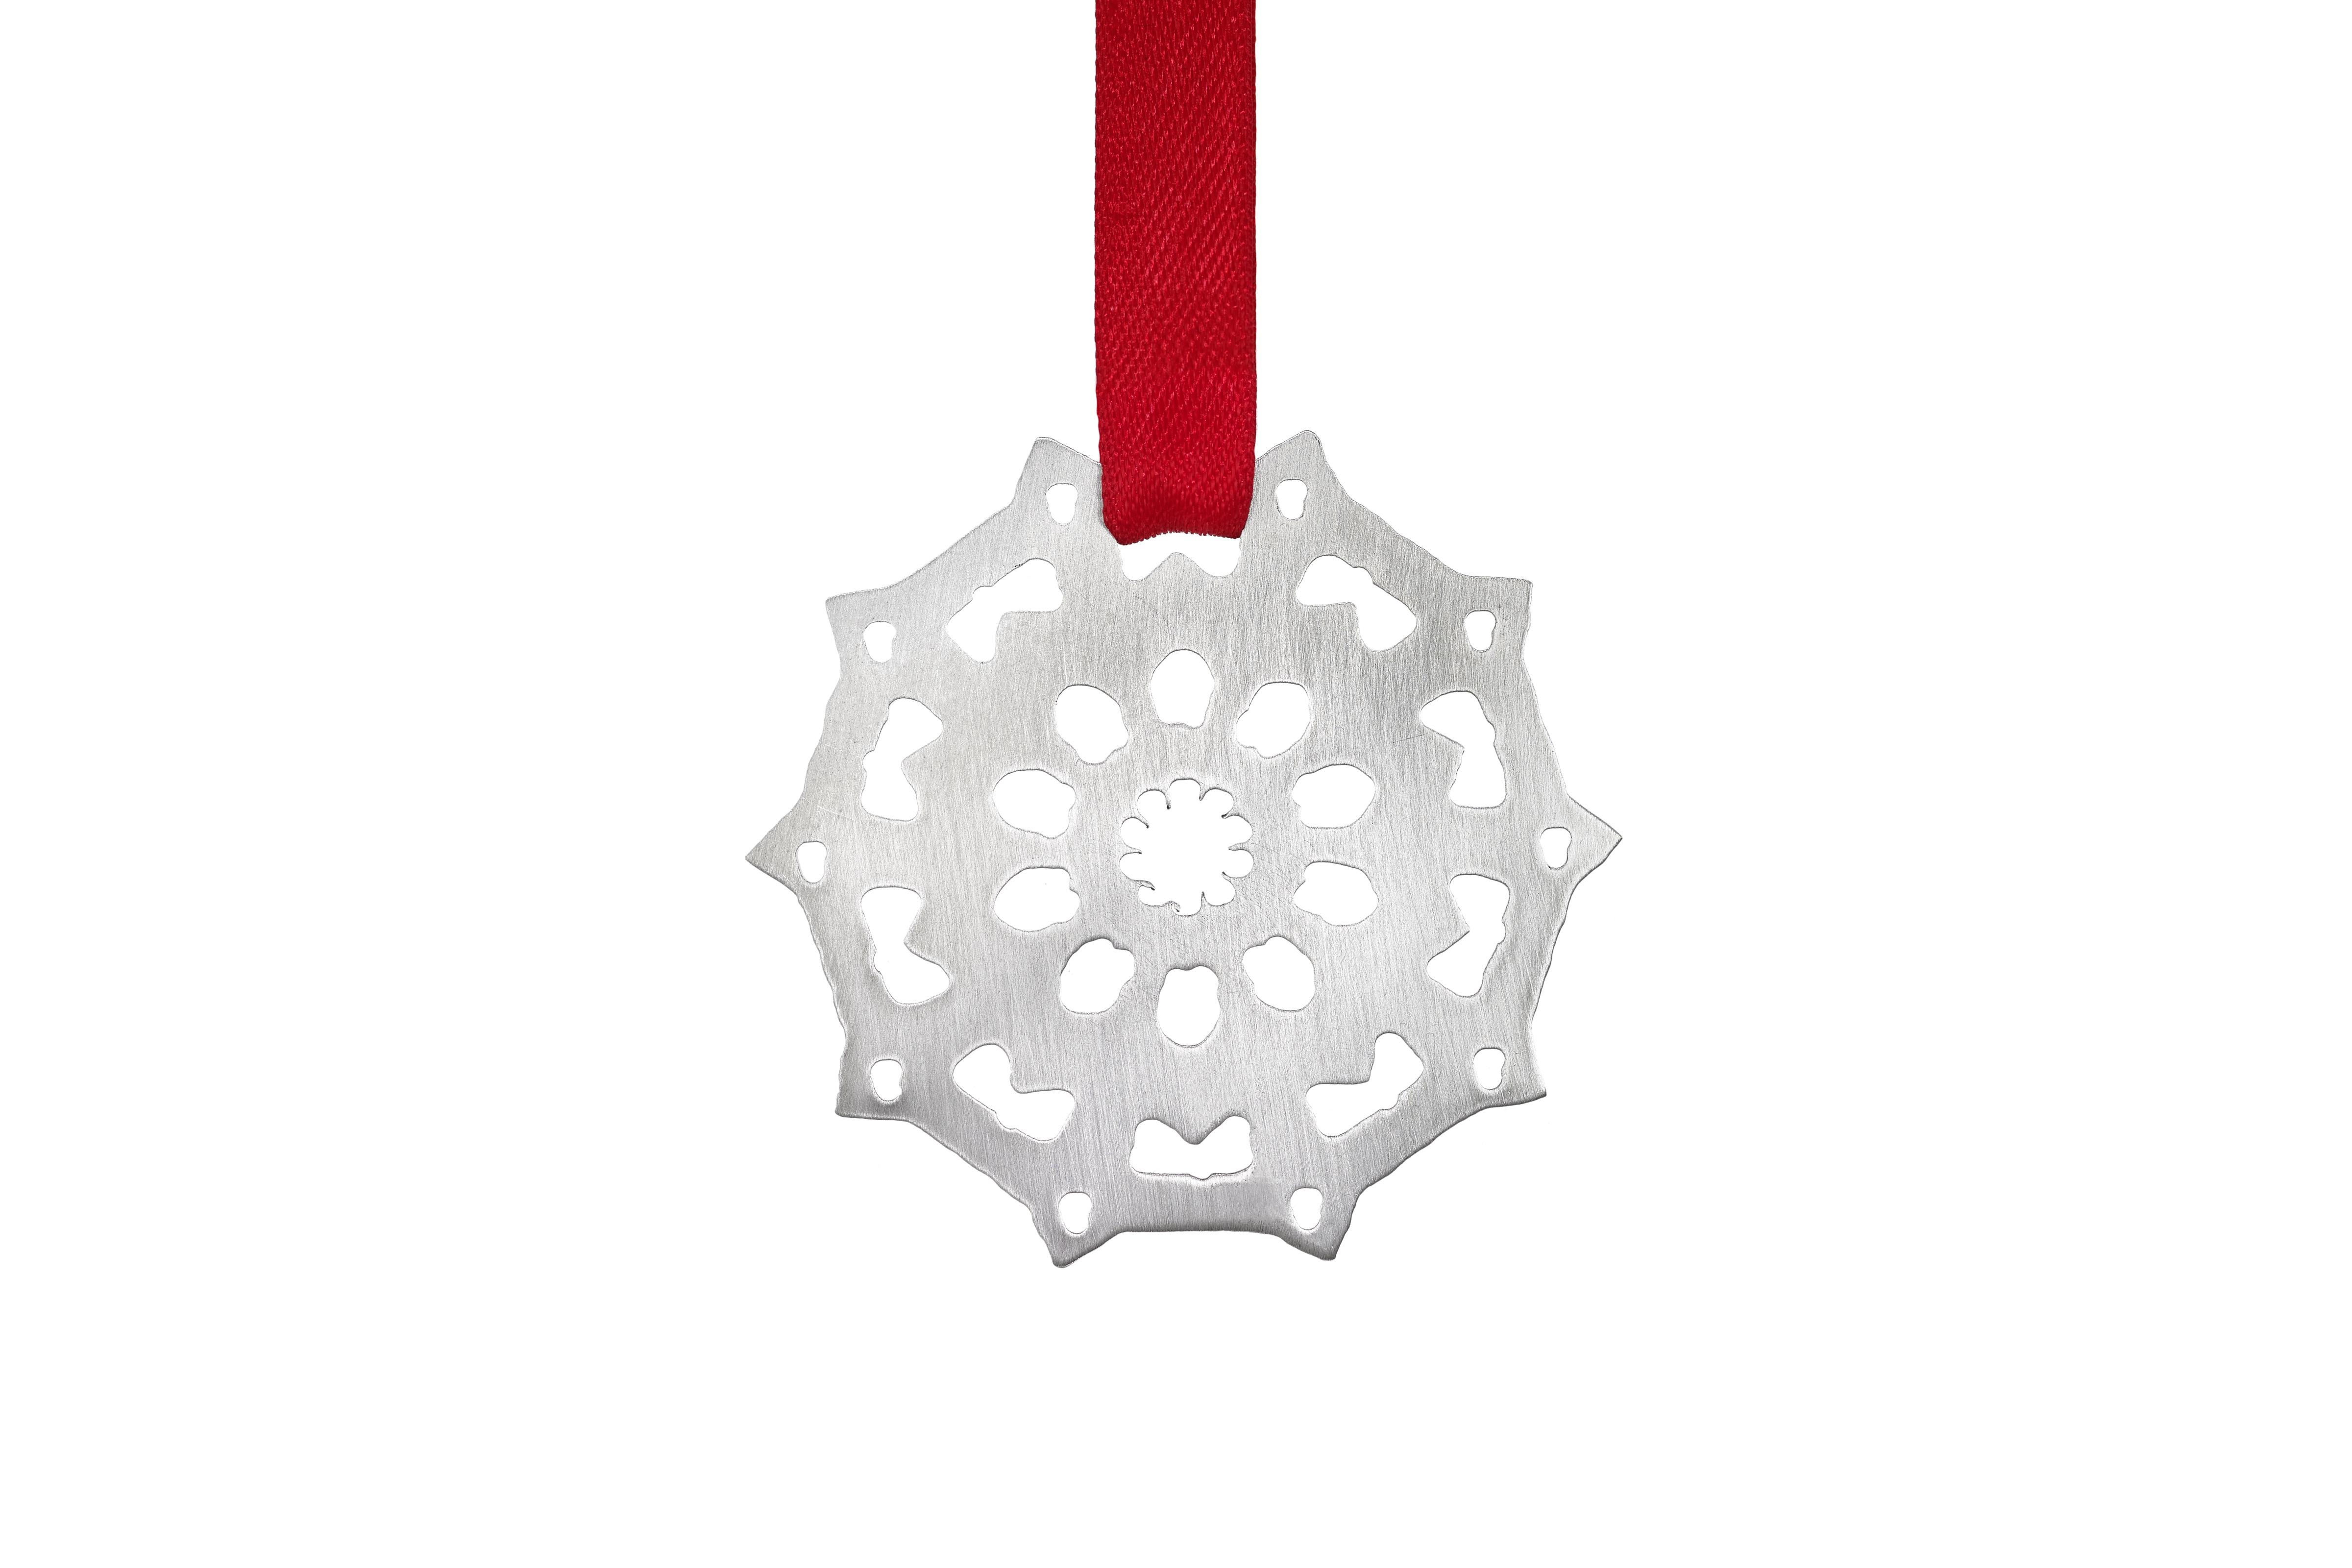 Medium Frosted Snowflake – Copyright BJRdesigns